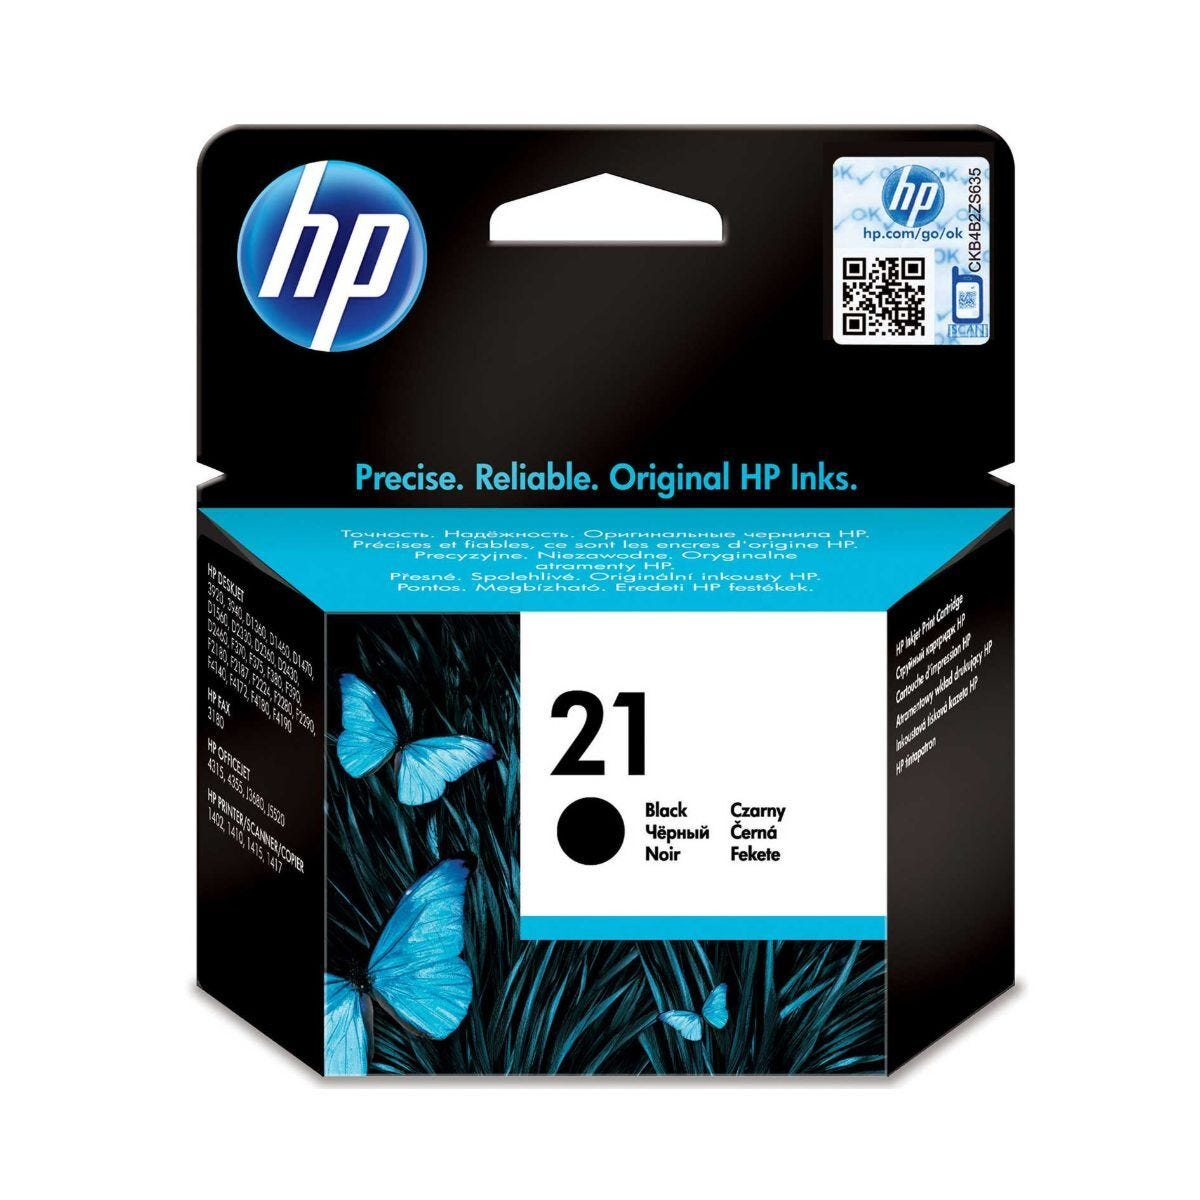 HP 21 Ink Cartridge 5ml